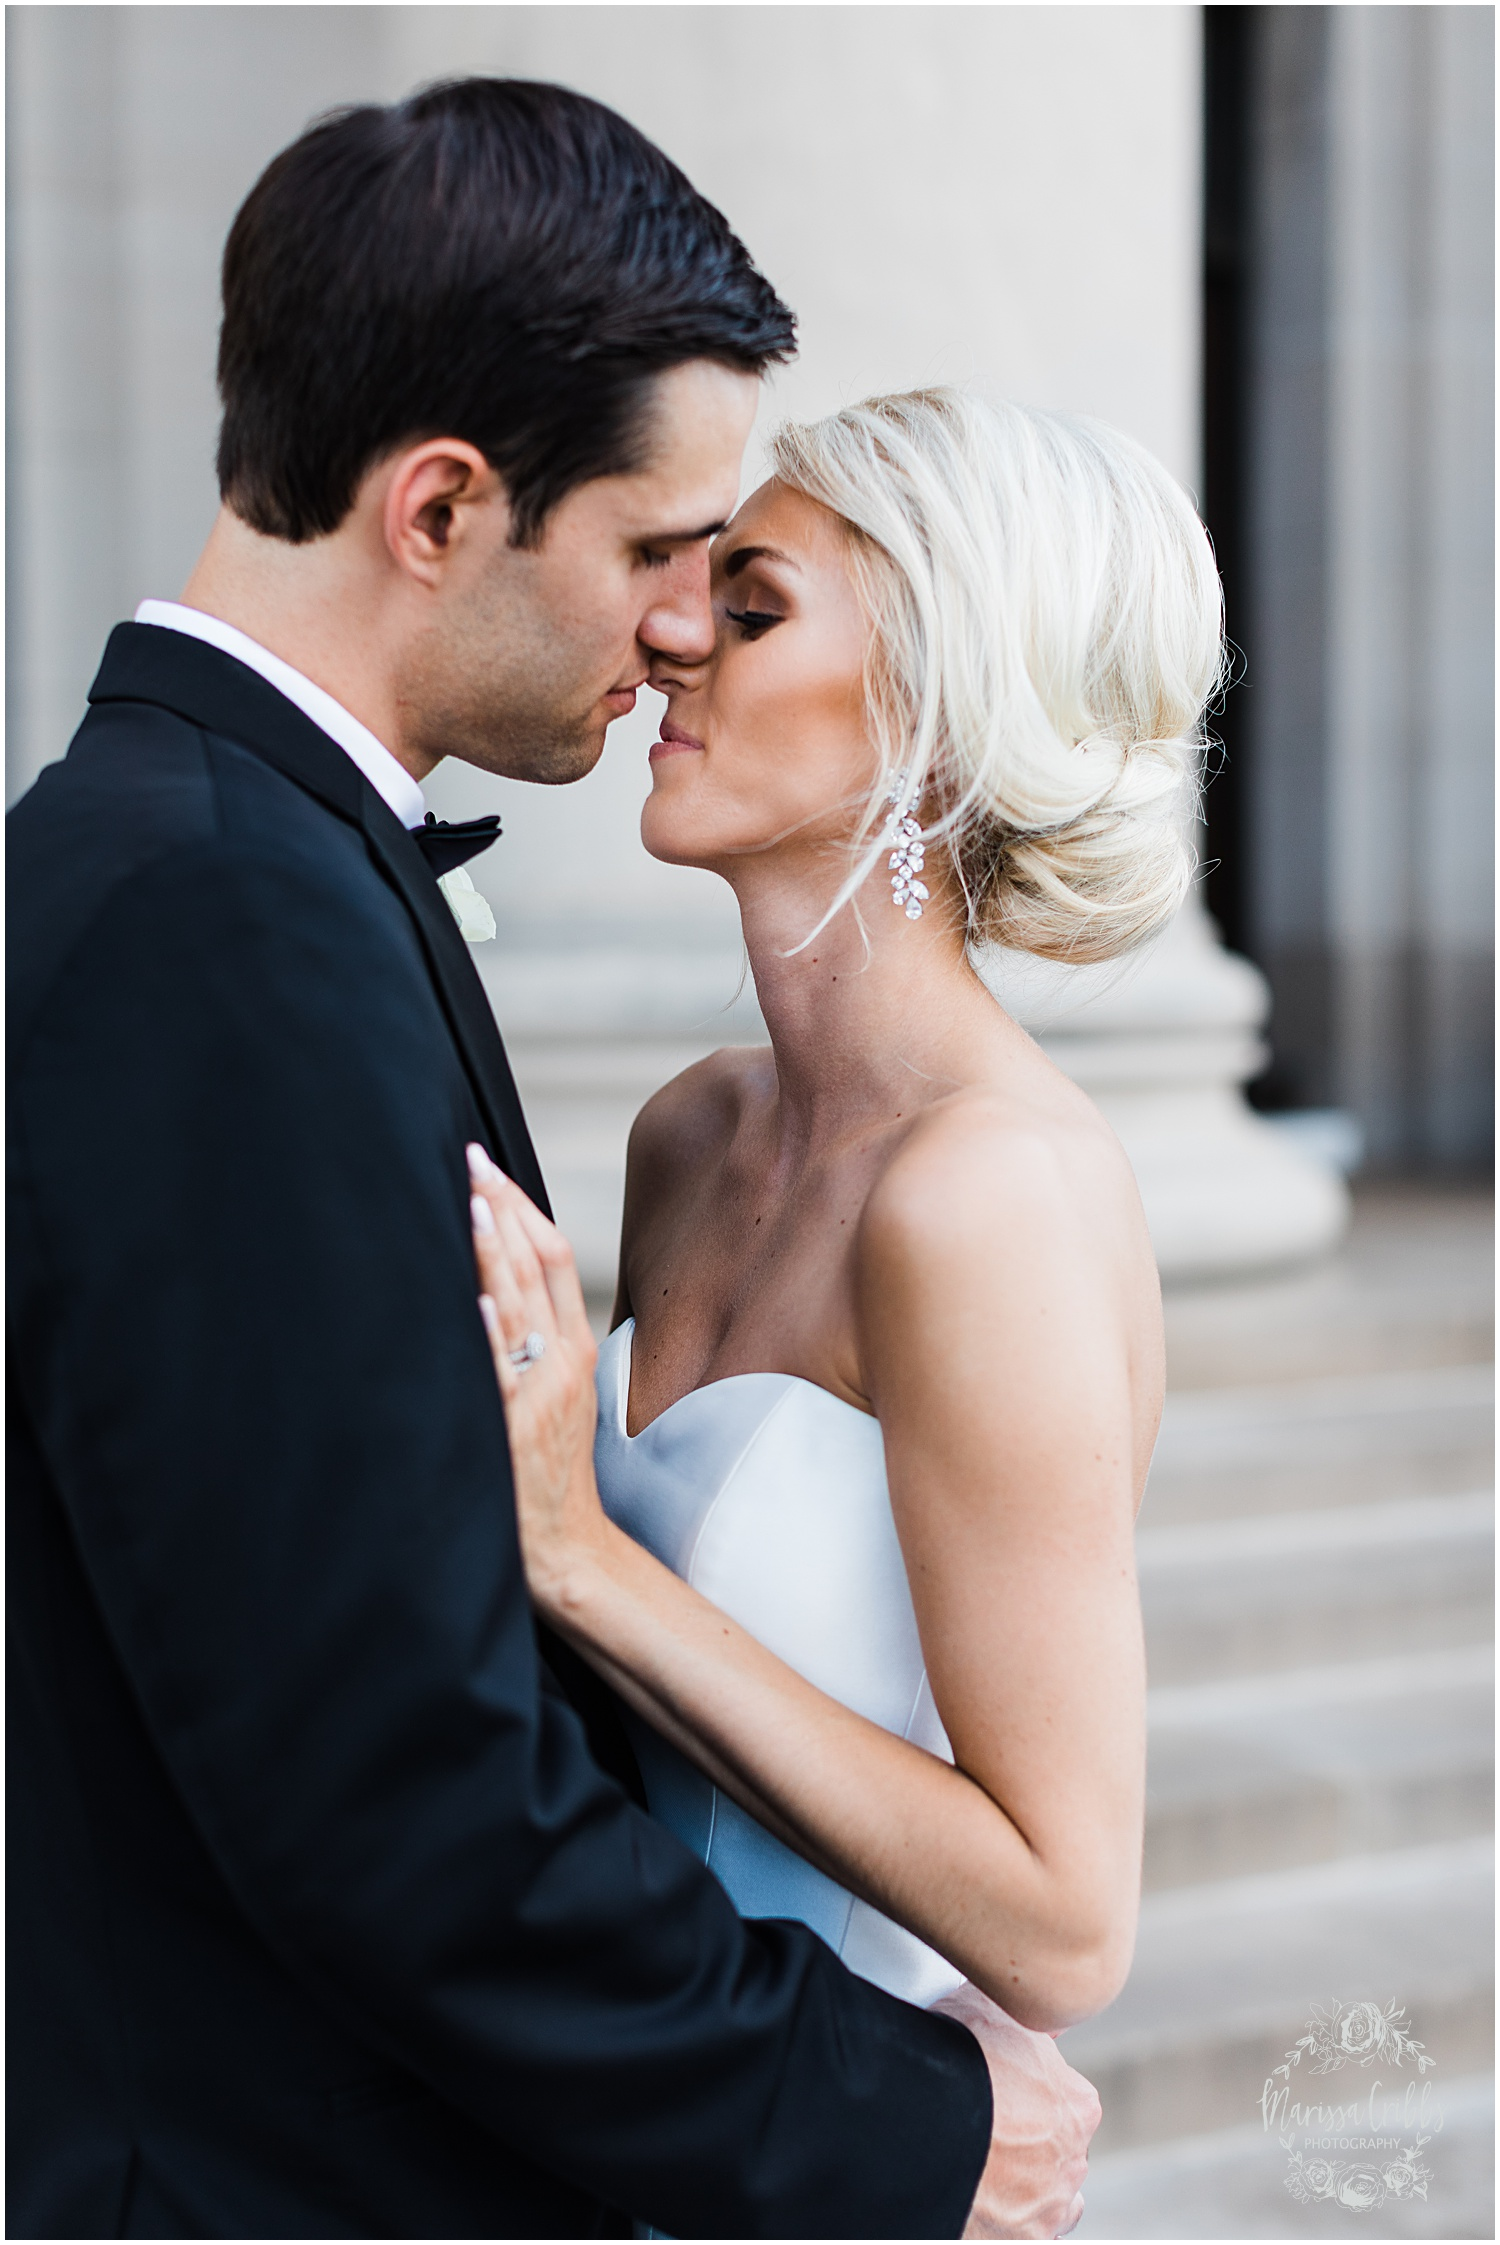 NOLL WEDDING | THE BRASS ON BALTIMORE | MARISSA CRIBBS PHOTOGRAPHY_6336.jpg